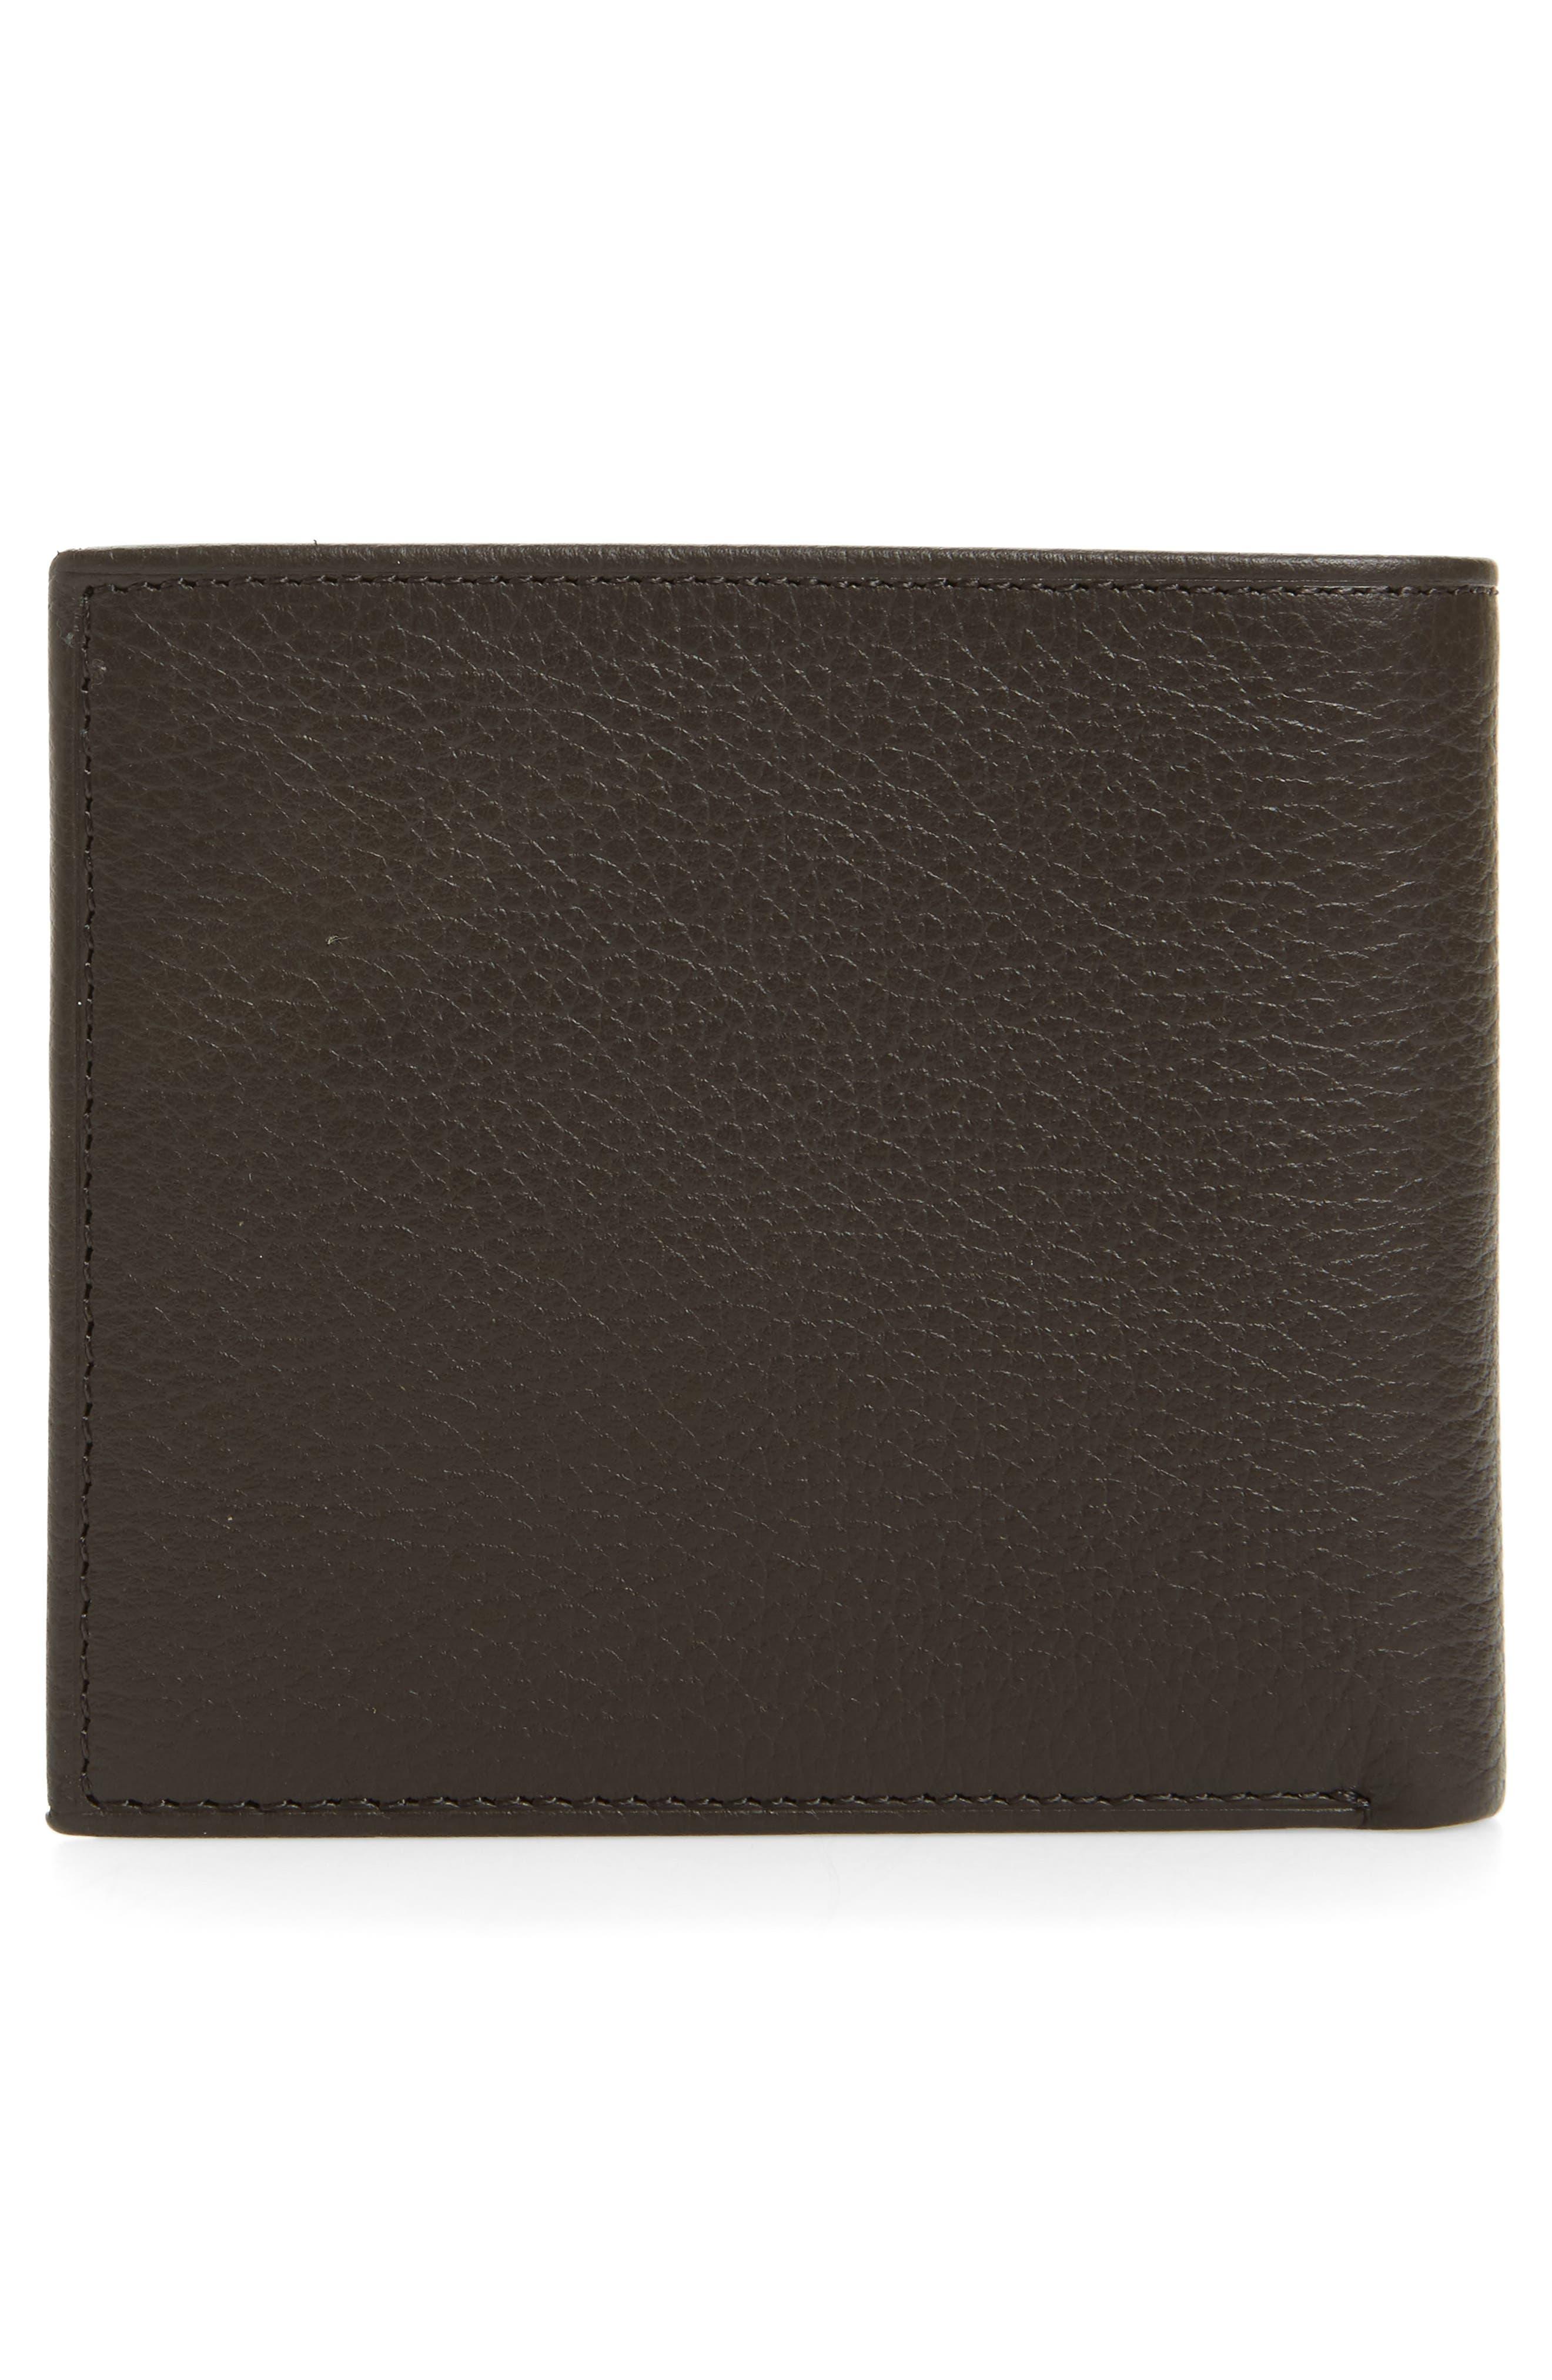 Alternate Image 3  - Polo Ralph Lauren Leather Wallet